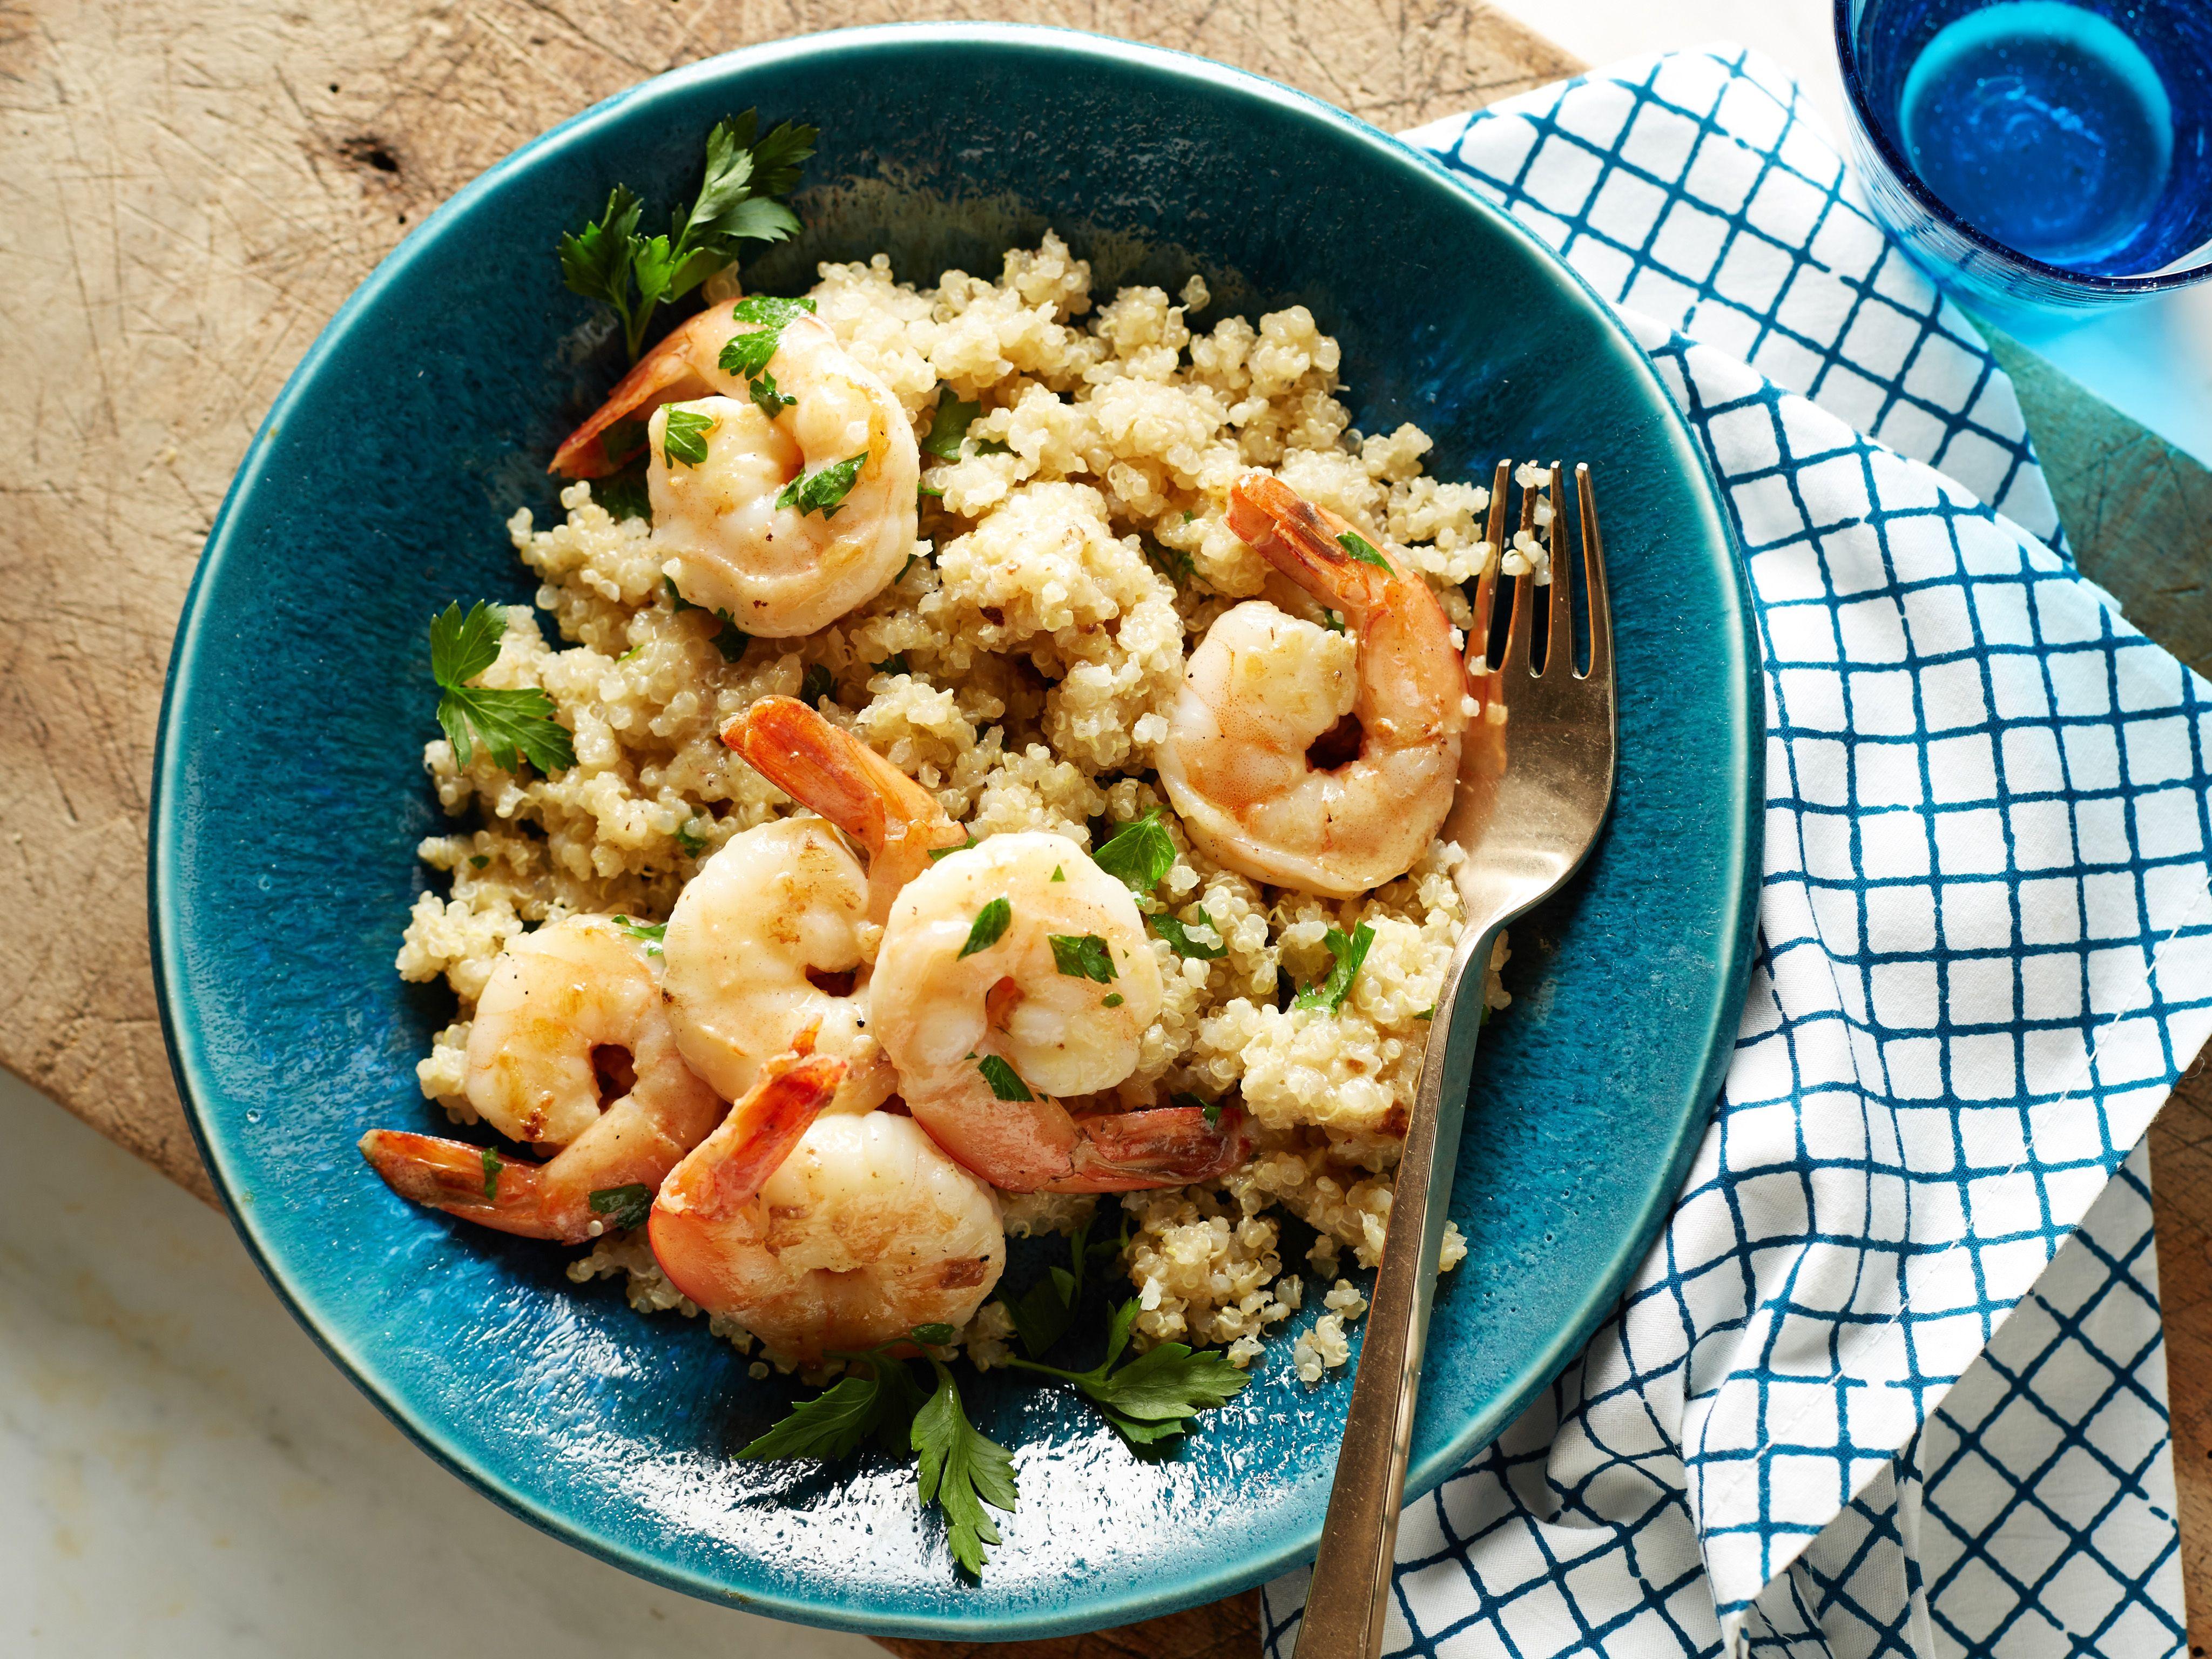 Healthy garlic shrimp and quinoa grits recipe garlic shrimp healthy garlic shrimp and quinoa grits recipe garlic shrimp quinoa and garlic forumfinder Images